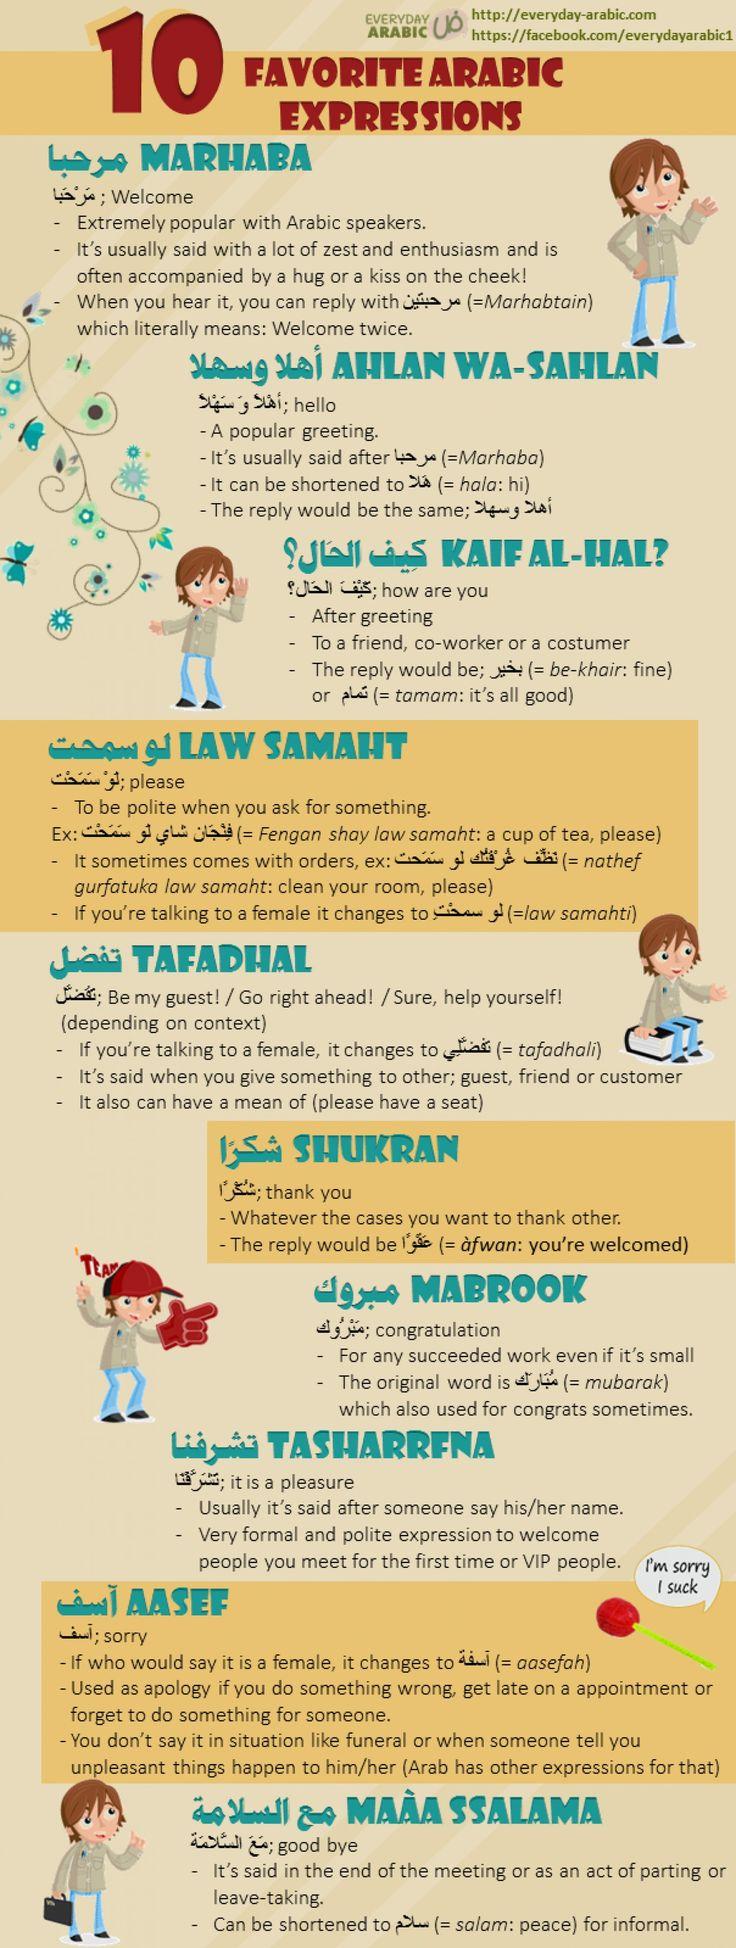 BEST WAY TO LEARN ARABIC | HELLOTALK - YouTube